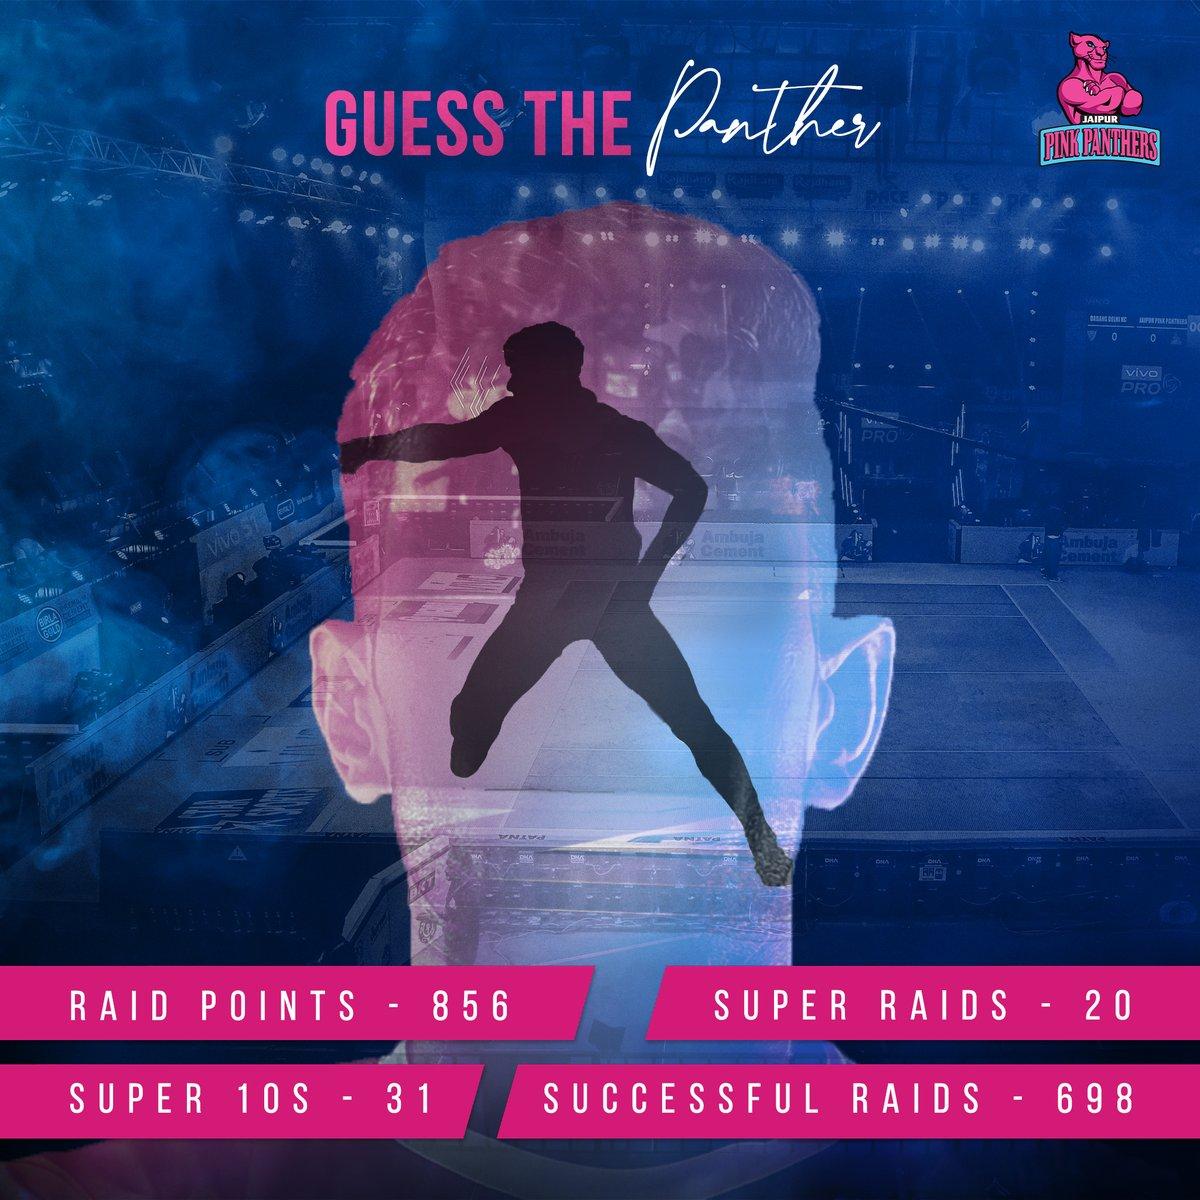 Can you guess your #Panther? 🧐 🤔  #PantherSquad #JaiHanuman #TopCats #JaipurPinkPanthers #JPP #Jaipur #vivoprokabaddi